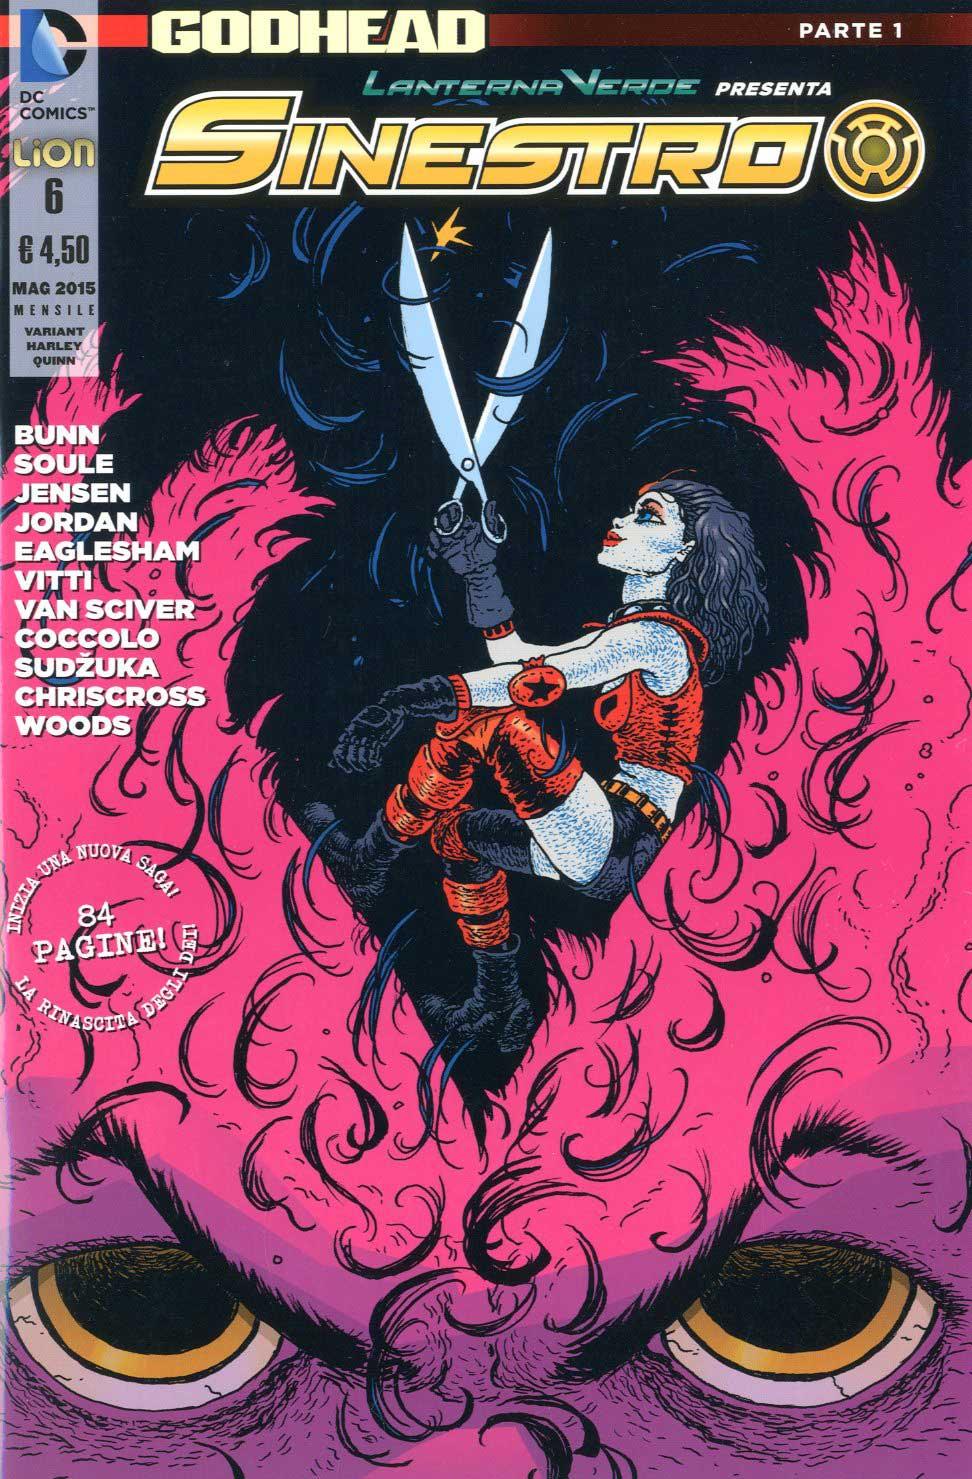 Lanterna Verde presenta: Sinestro n. 6 - Variant Harley Quinn